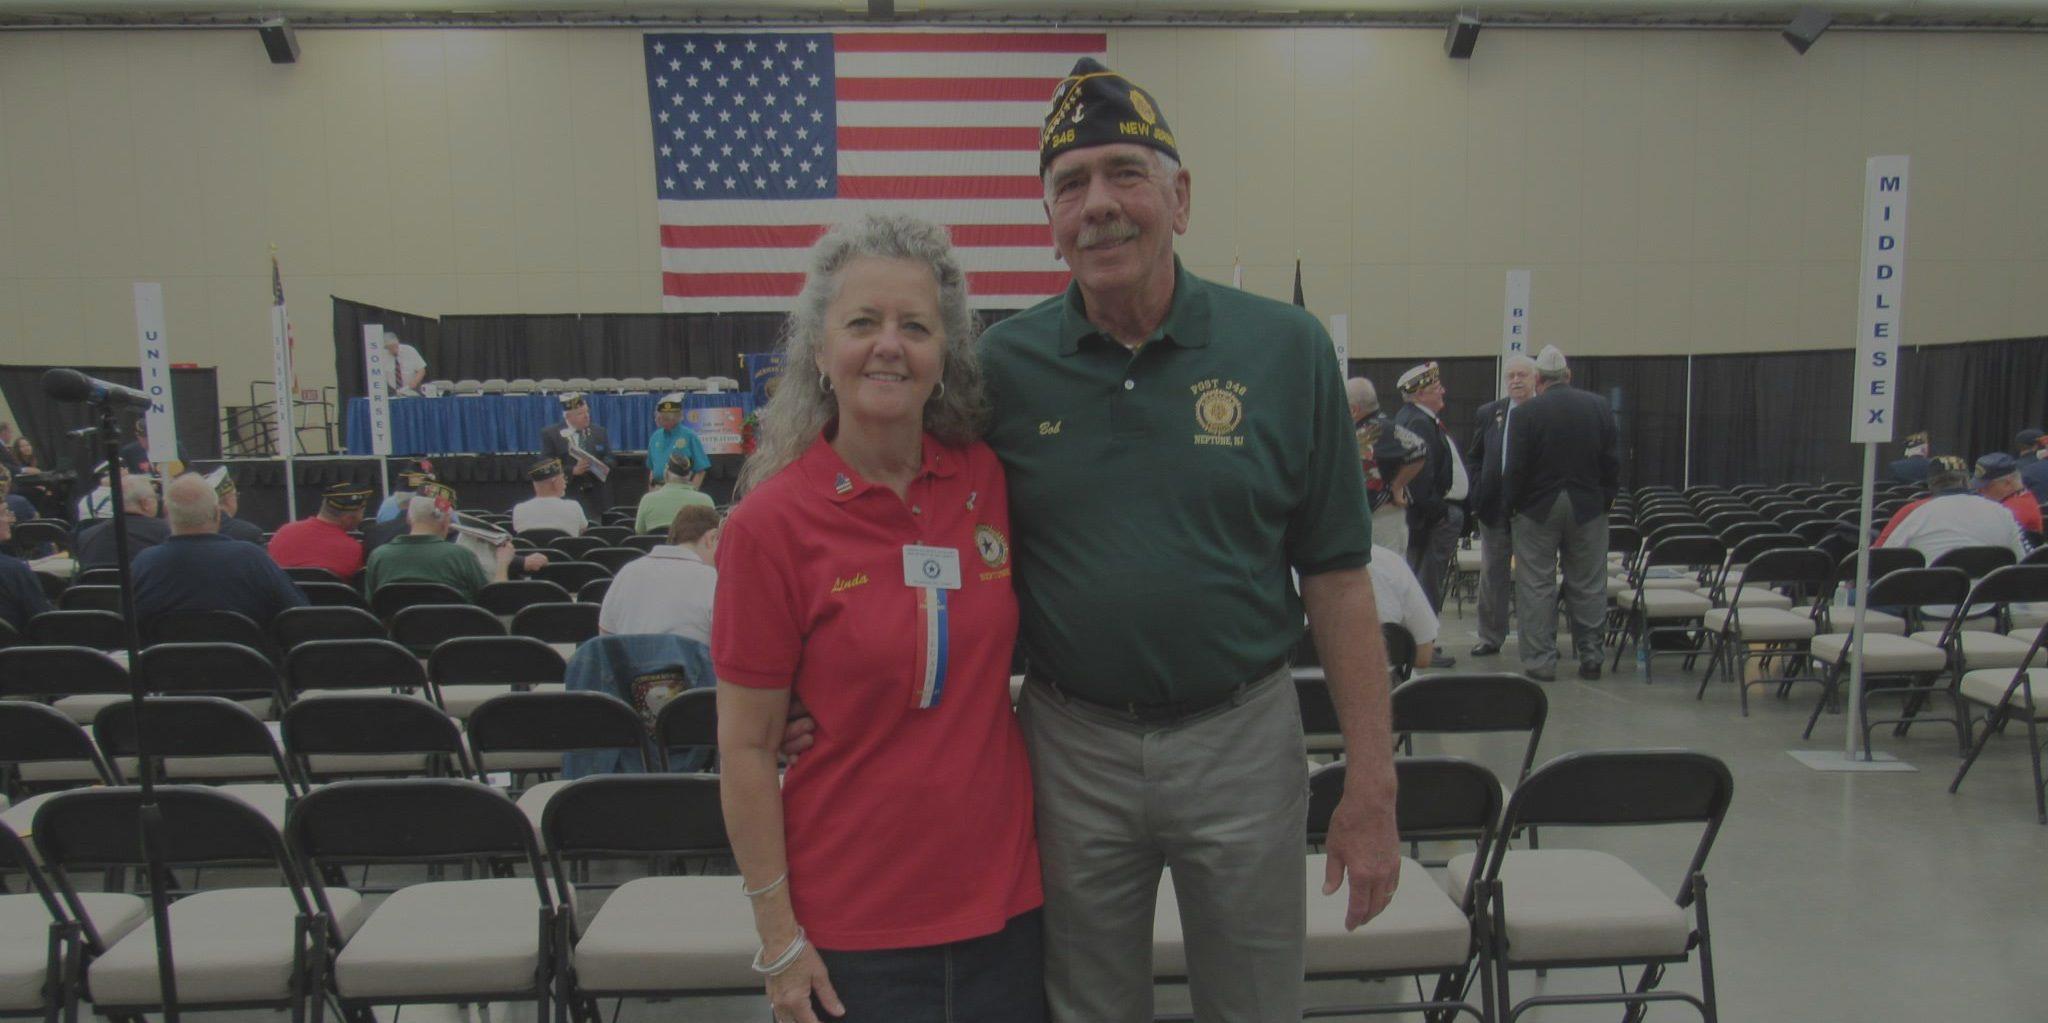 American Legion Post 346